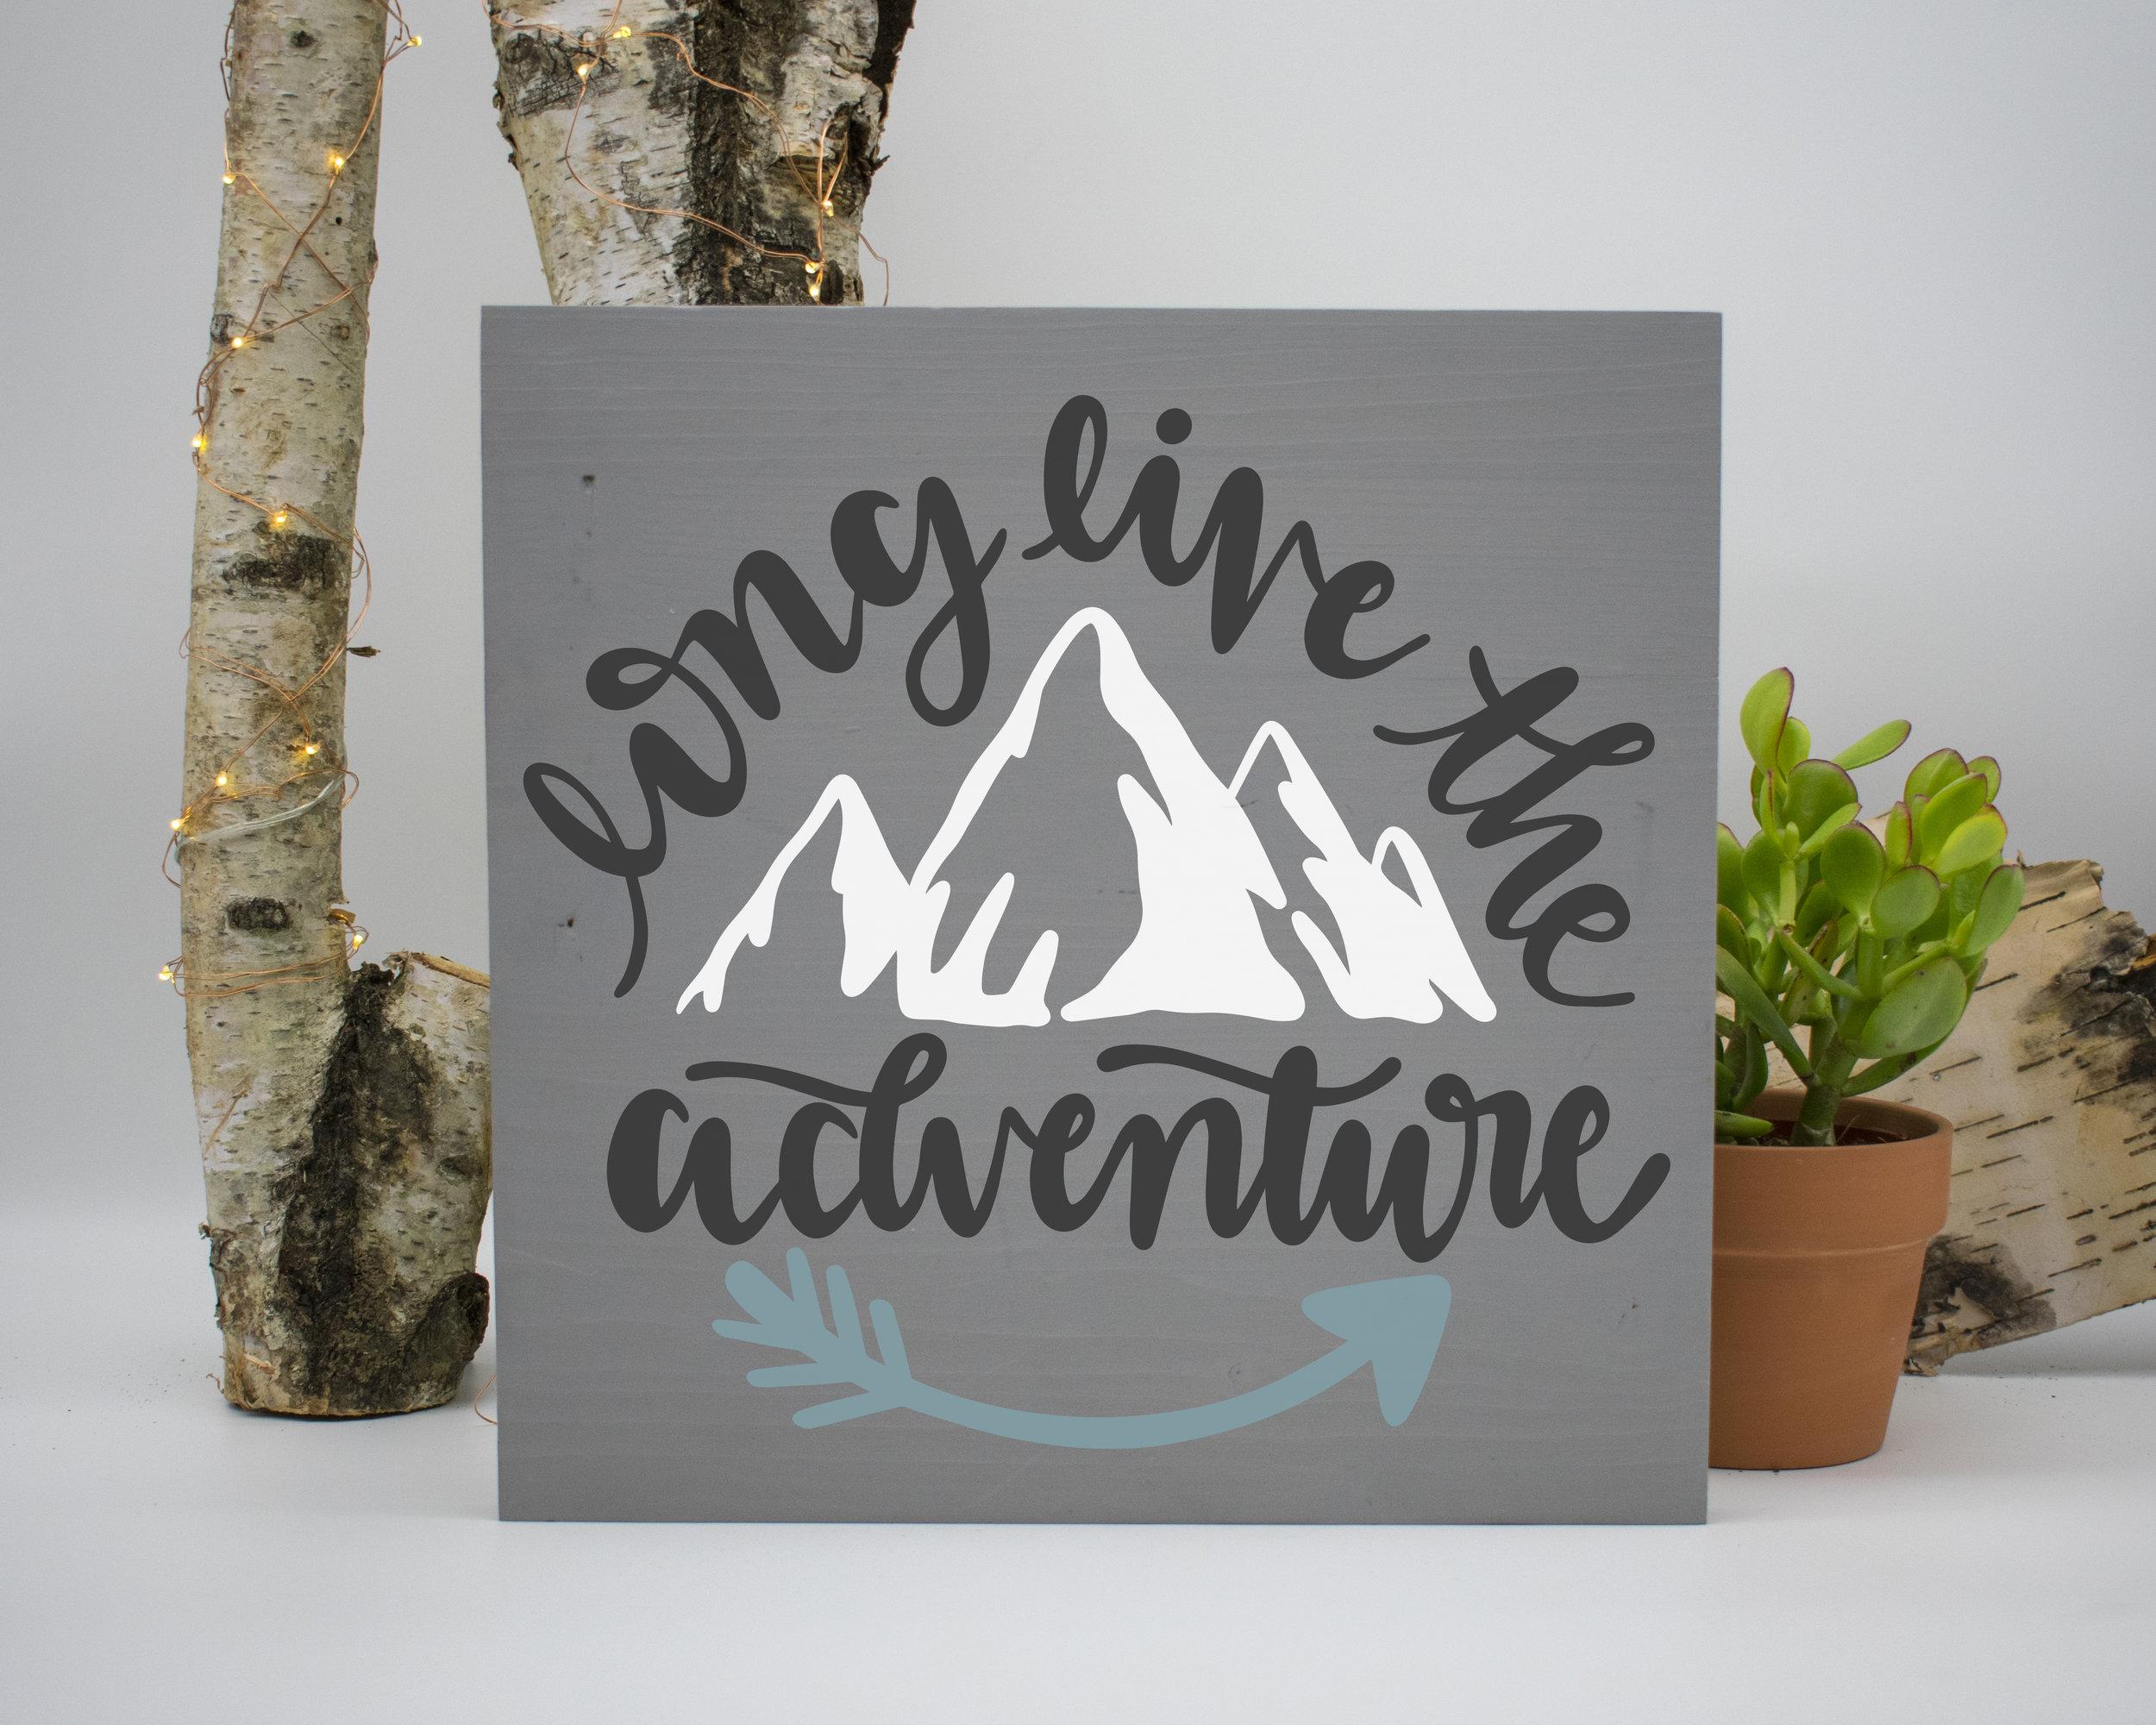 longliveadventure.jpg